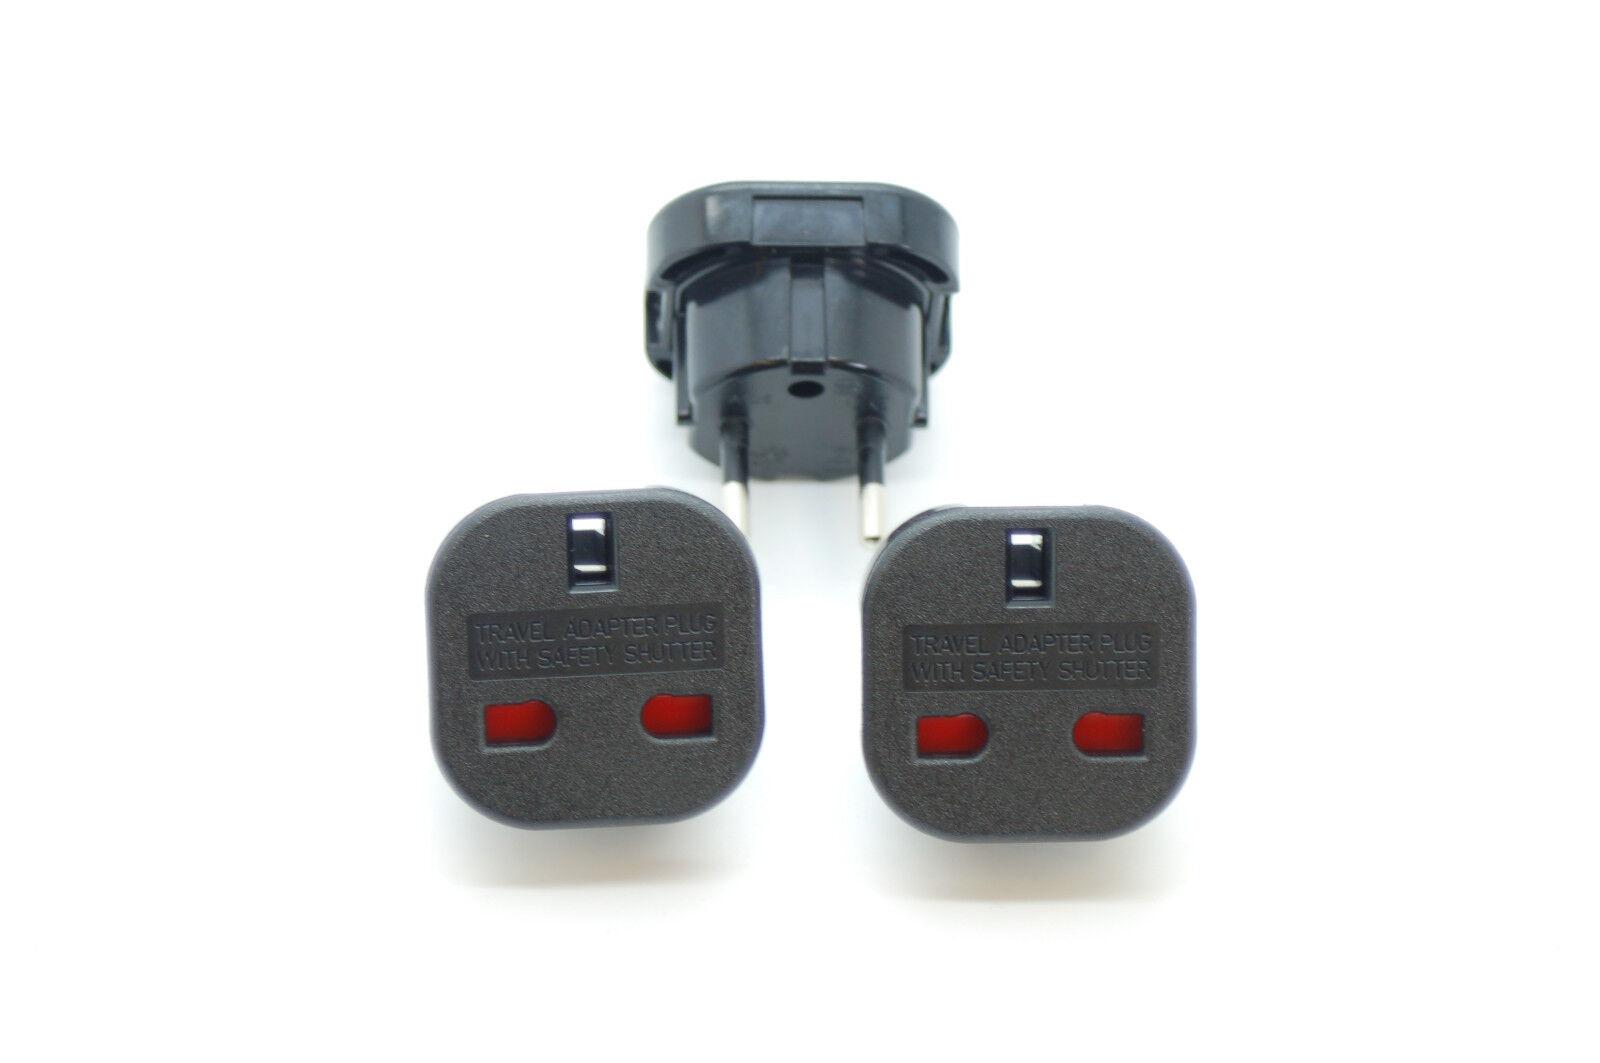 3 pièces Royaume-Uni Royaume-Uni Royaume-Uni à l'UE 2 Pin Power Plug, Travel Wall Adaptateur, Fire Proof, Certifié CE 79134e